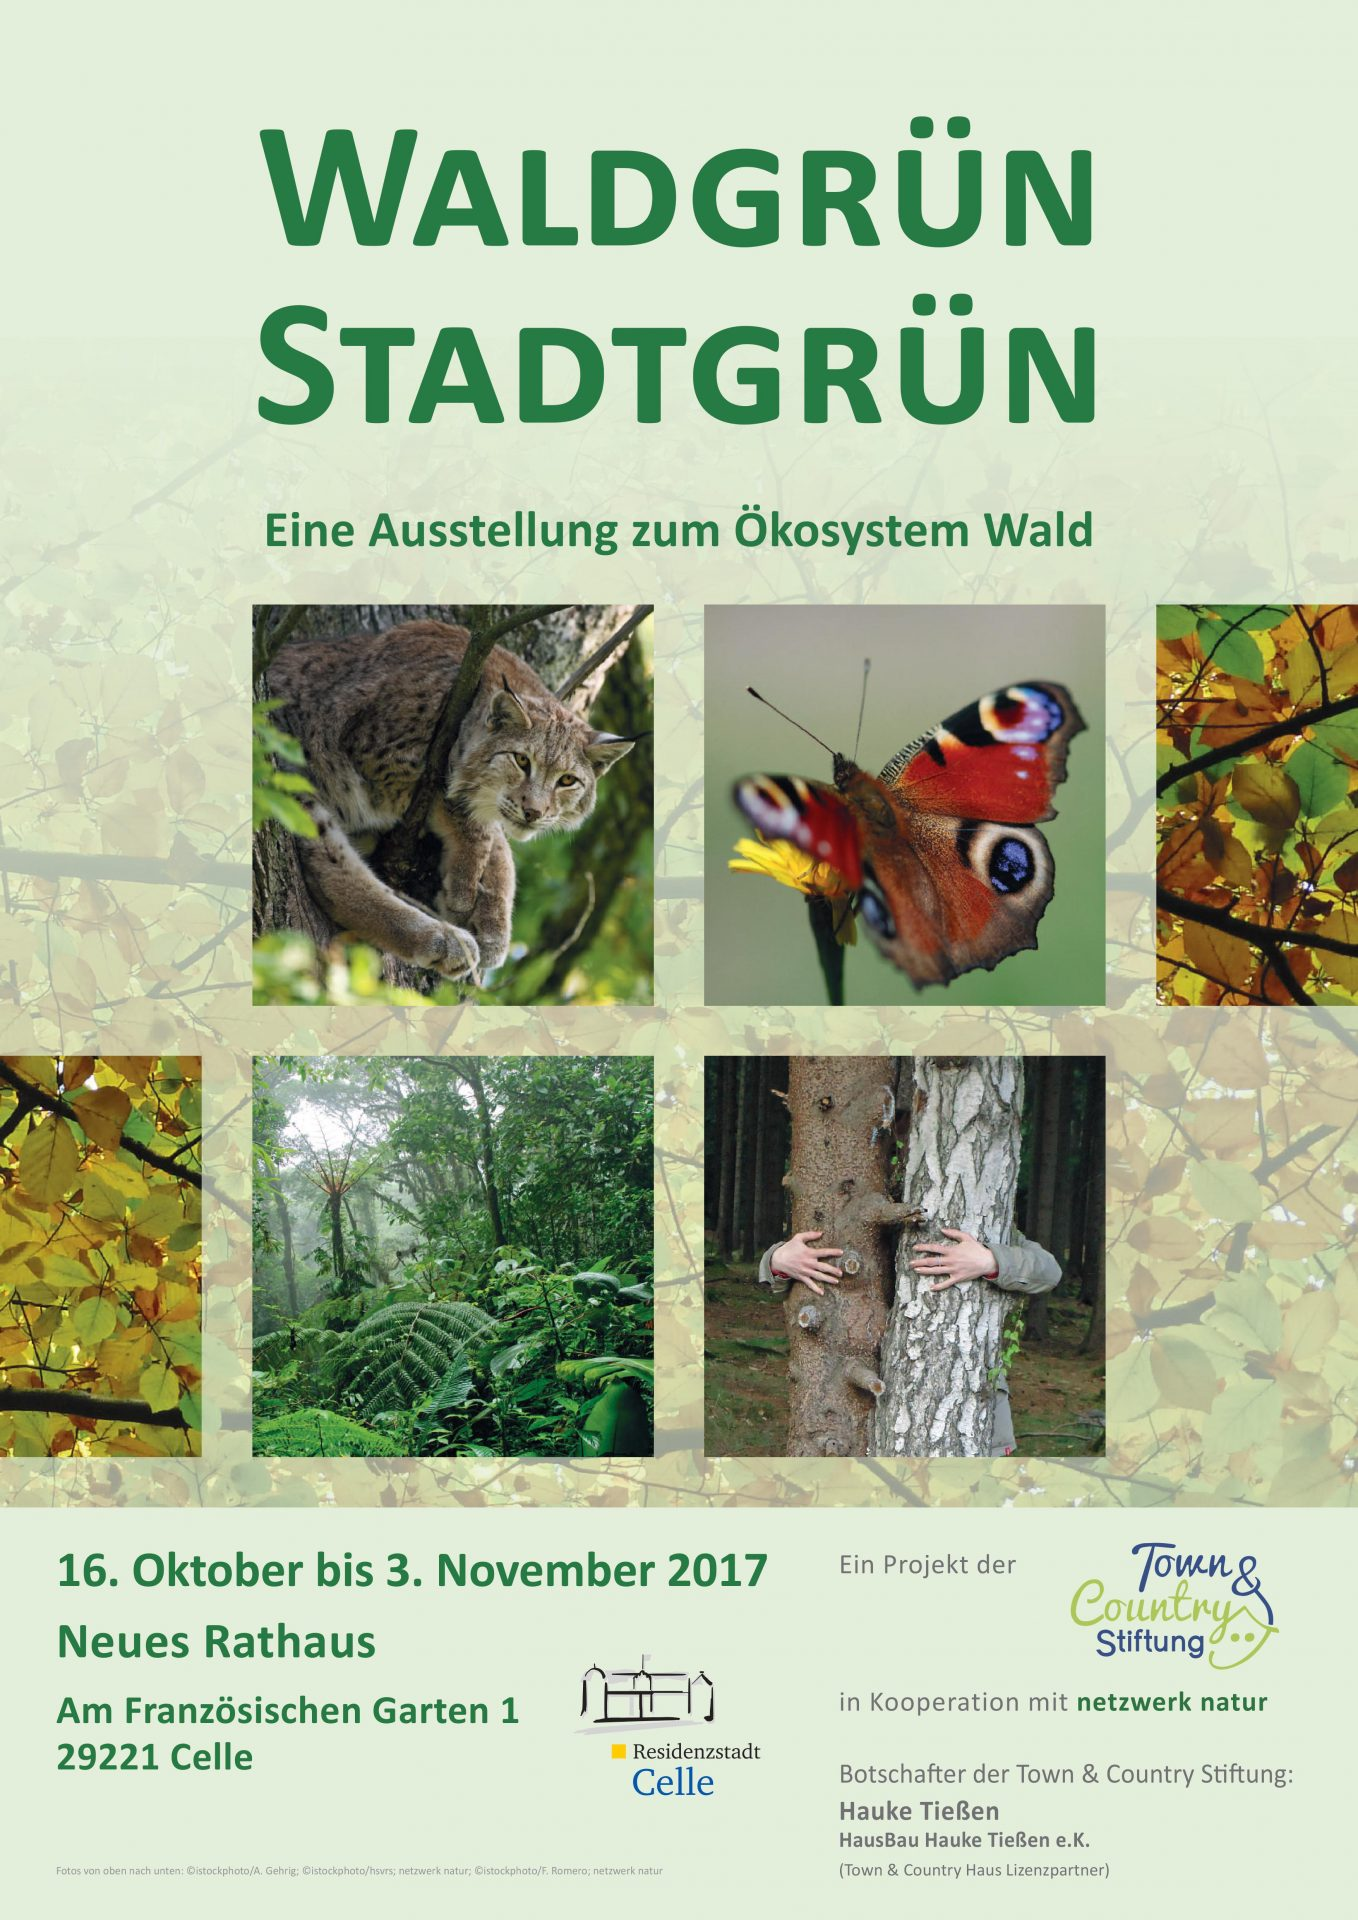 netzwerk natur, Plakat WALDGRÜN - STADTGRÜN, Neues Rathaus Celle